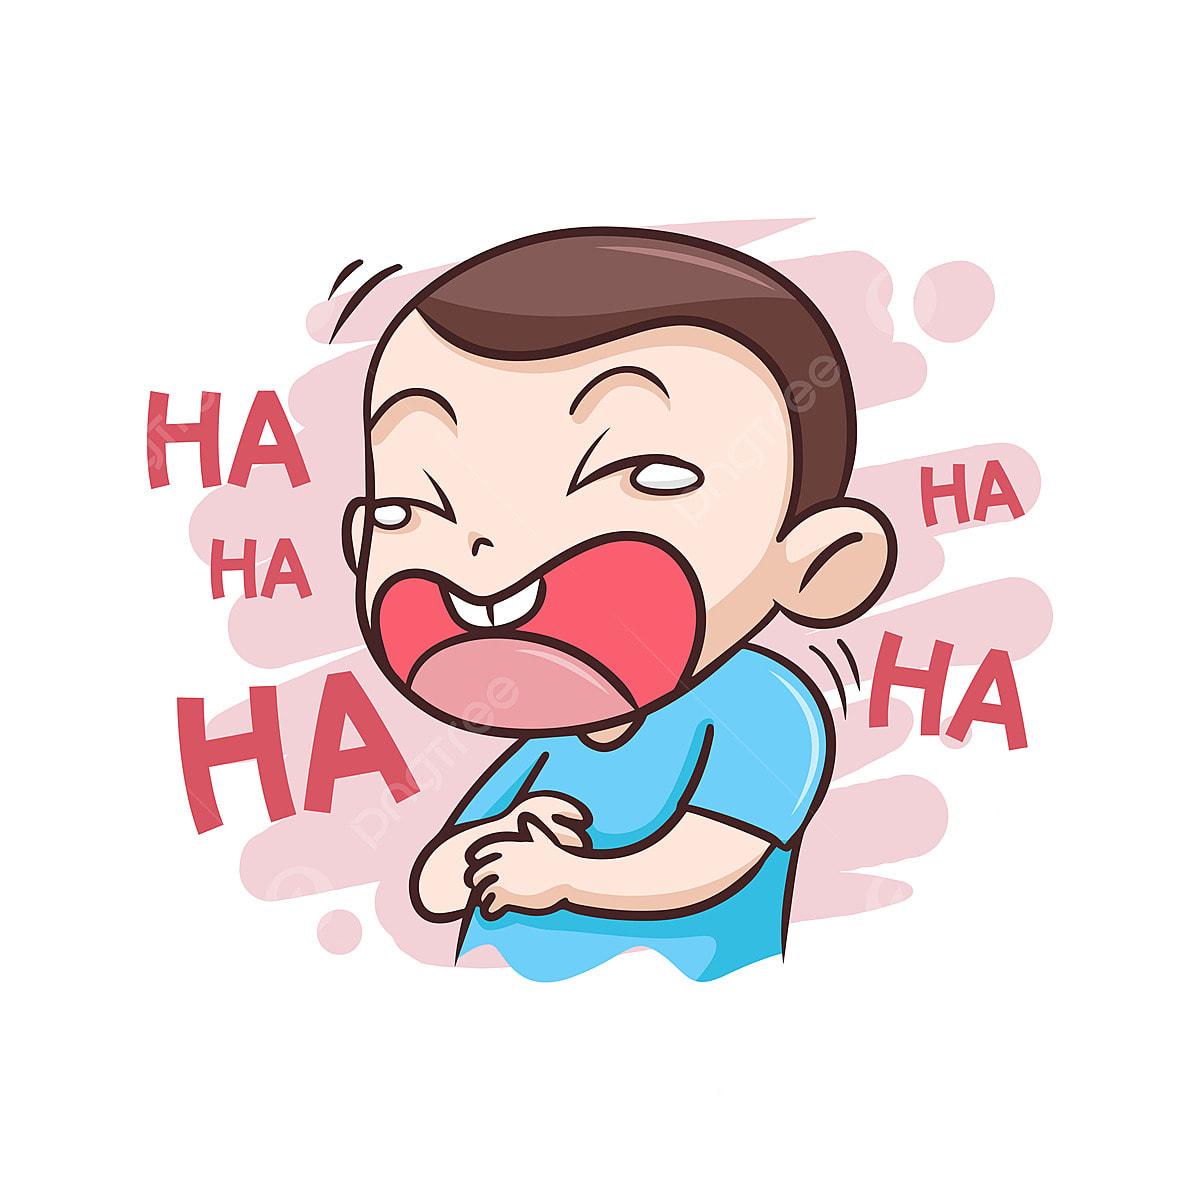 Anak Laki Laki Tertawa Sangat Gembira Ilustrasi Orang